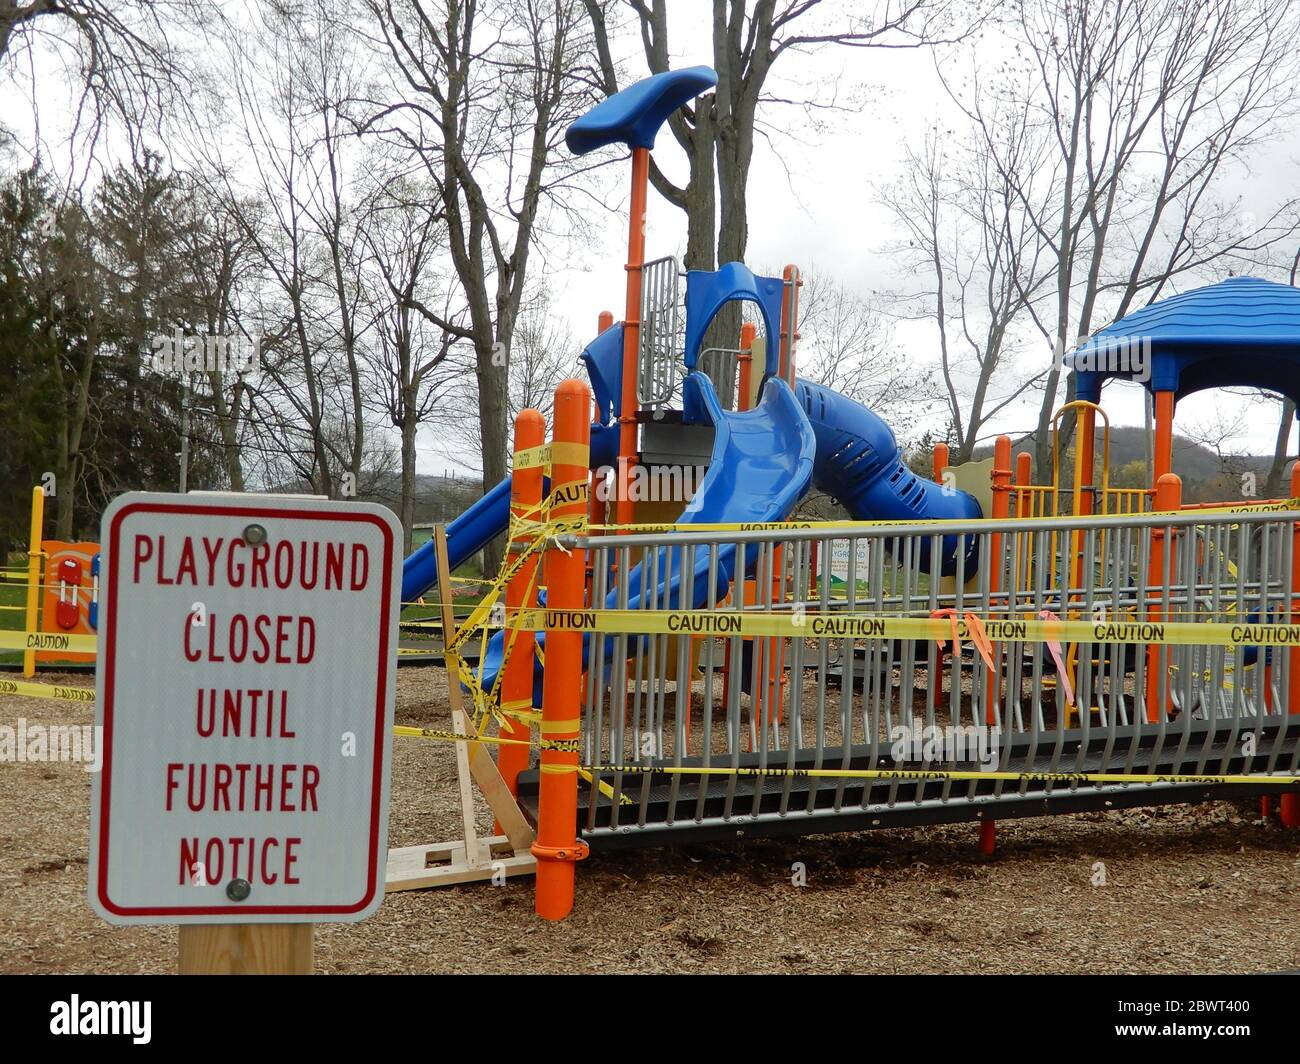 Playground Closed Due to Pandemic, Wellsville, New York, USA. Stock Photo